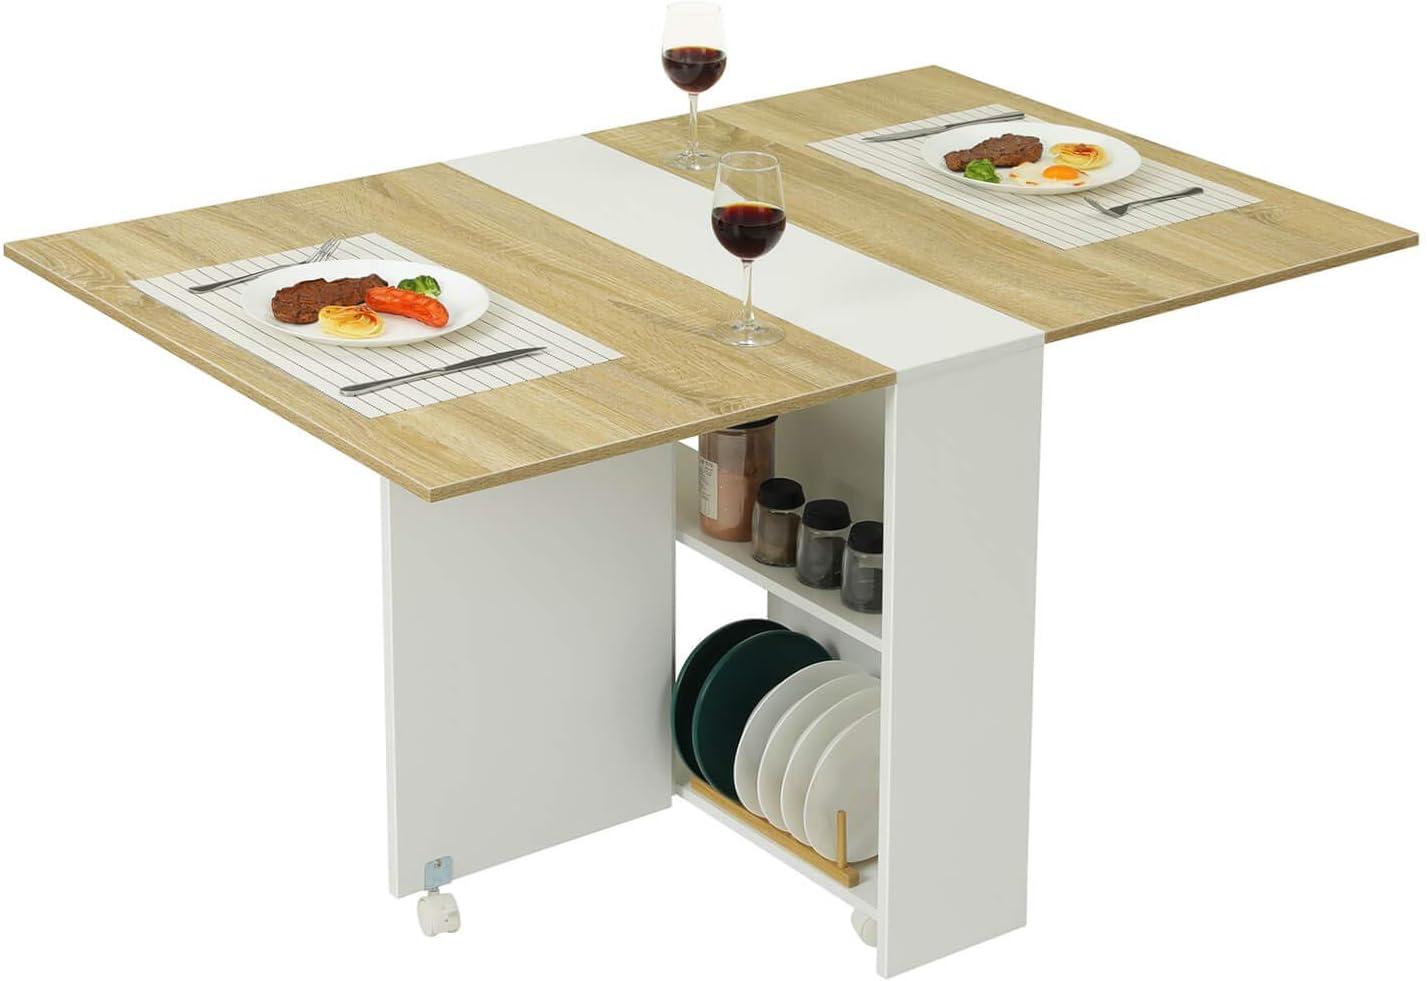 - Amazon.com: Tiptiper Folding Dining Table, Versatile Dinner Table